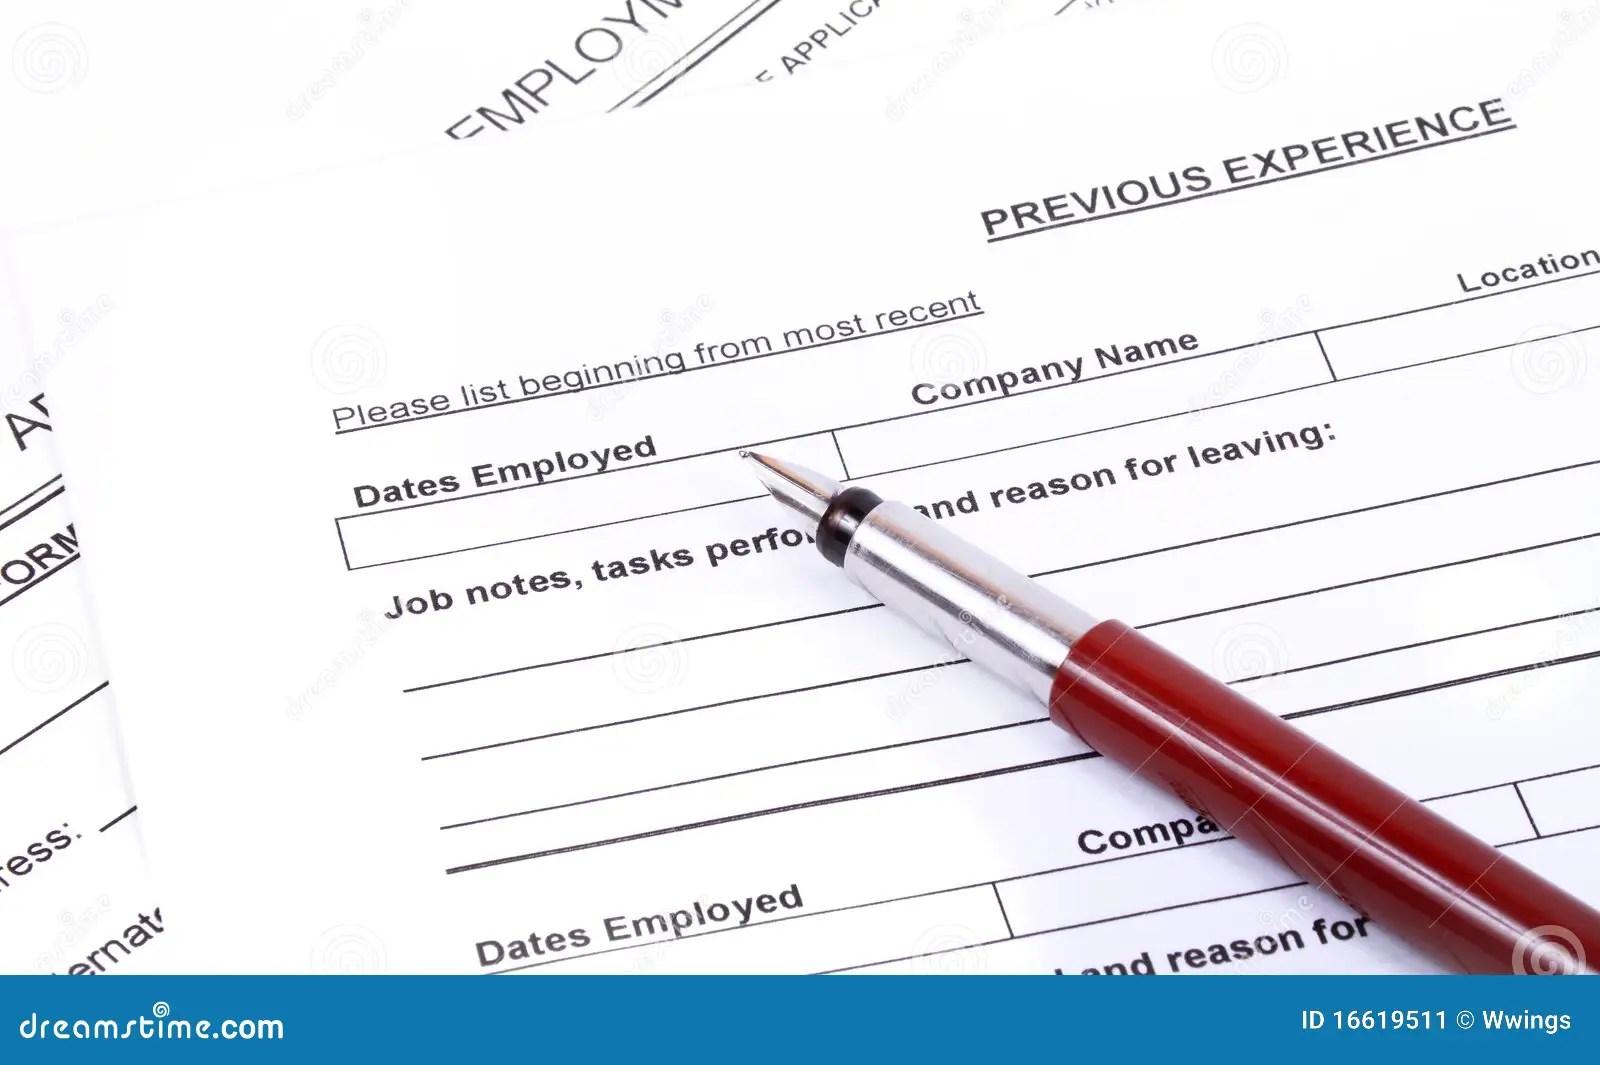 job application asking for skills bio data maker job application asking for skills skills to put on a job application chron work experience stock